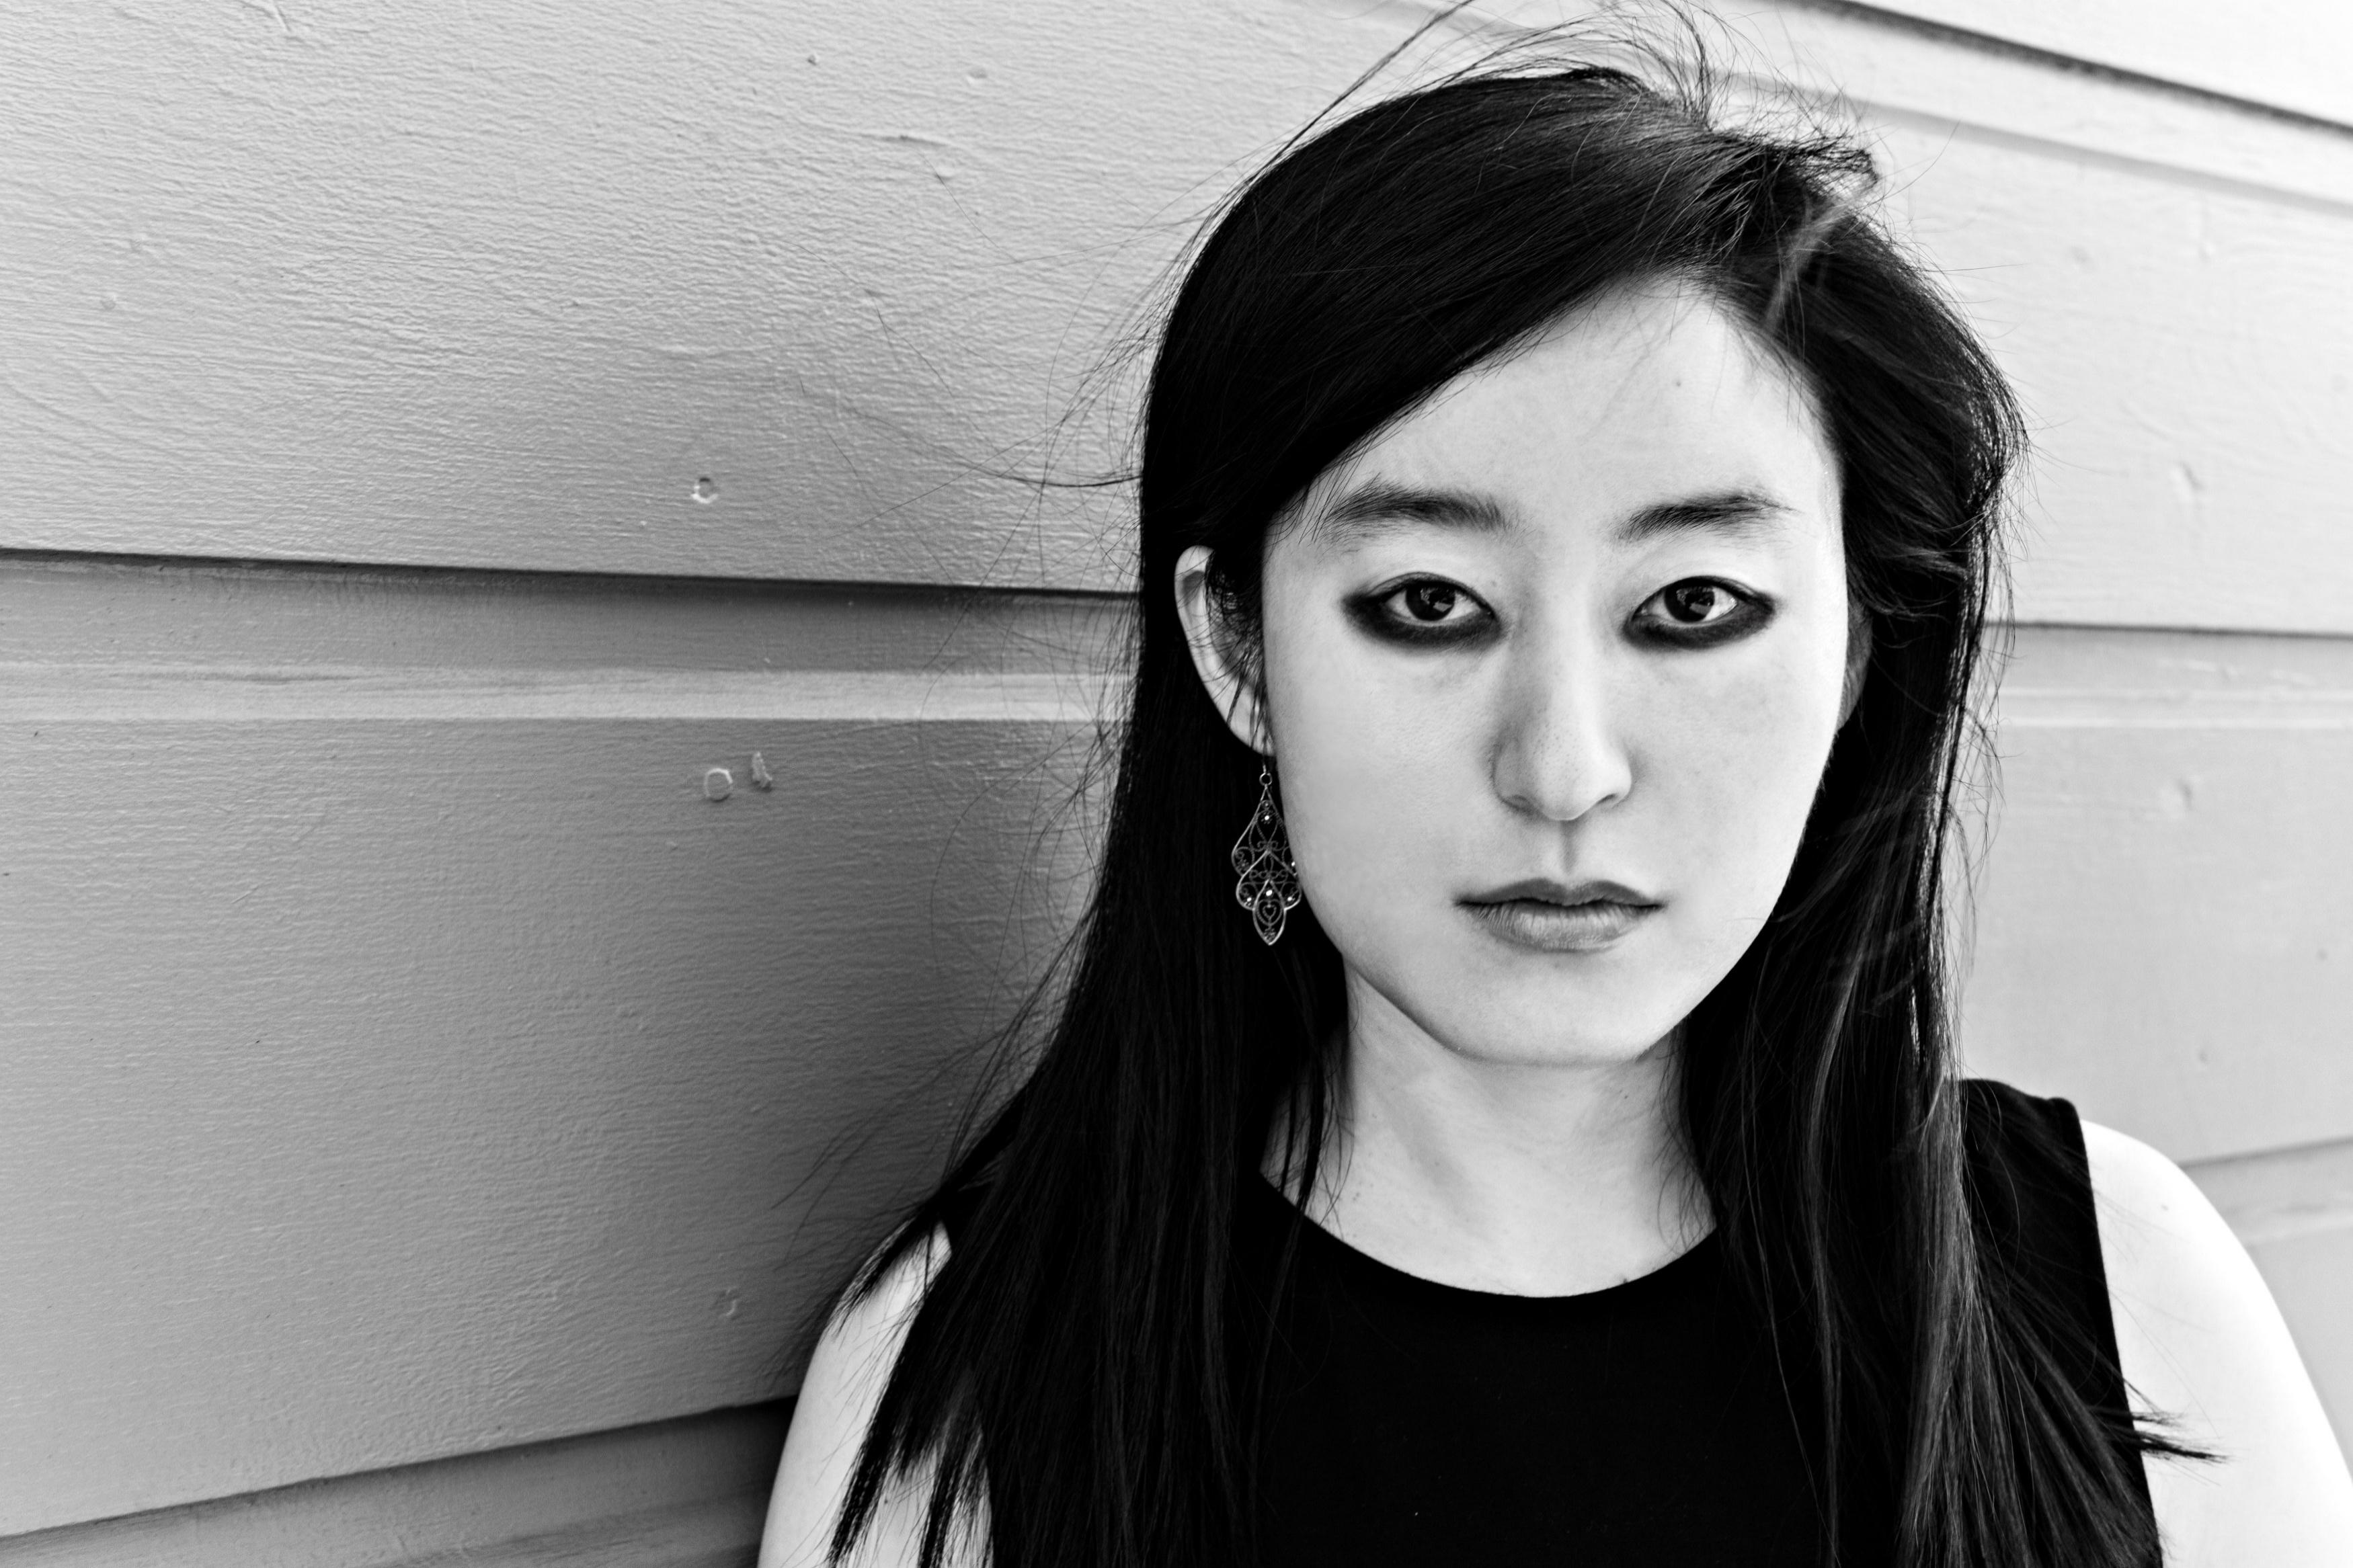 R.O. Kwon photo